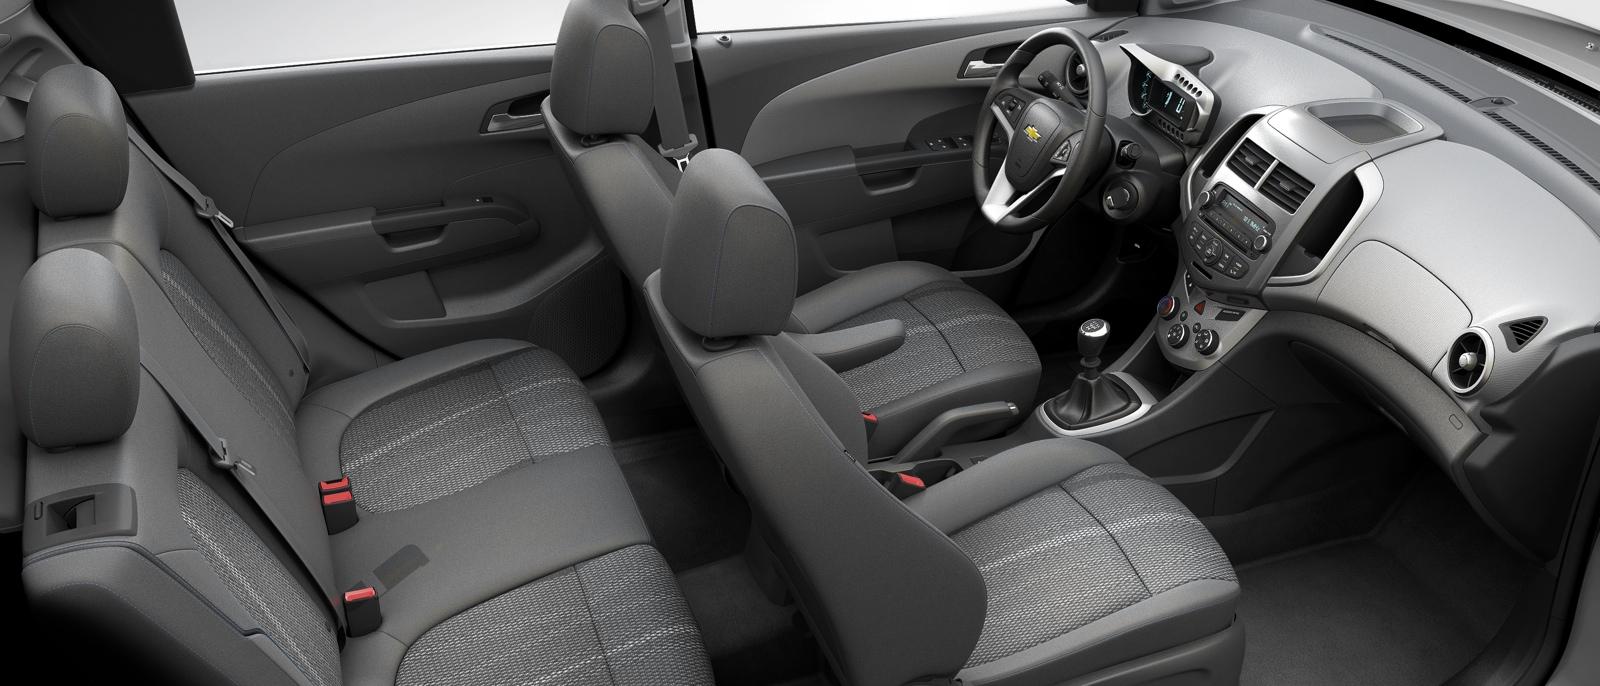 2015 Chevrolet Sonic interior